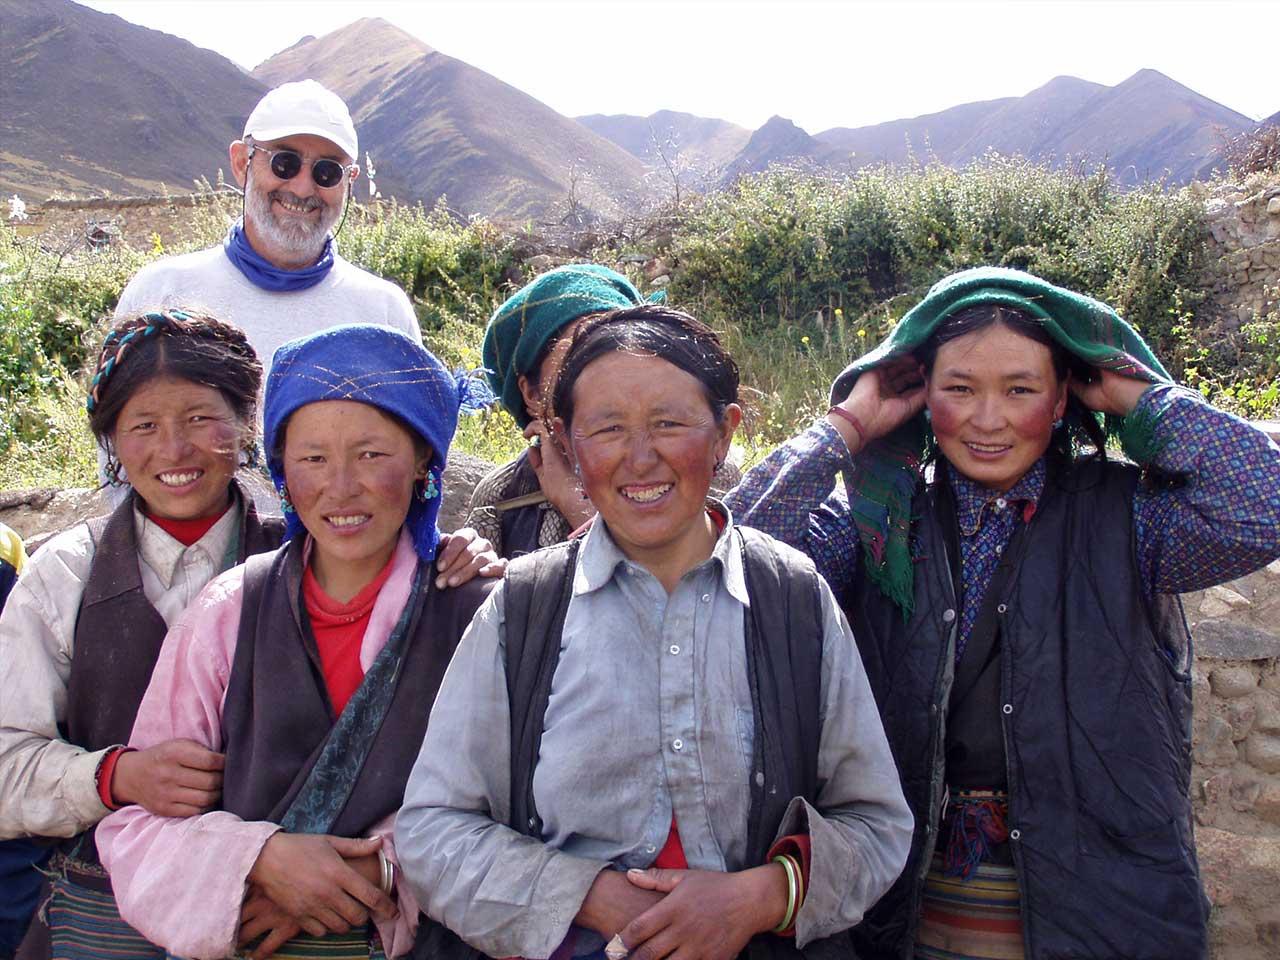 Tibet-Nepal Overland Group Tour